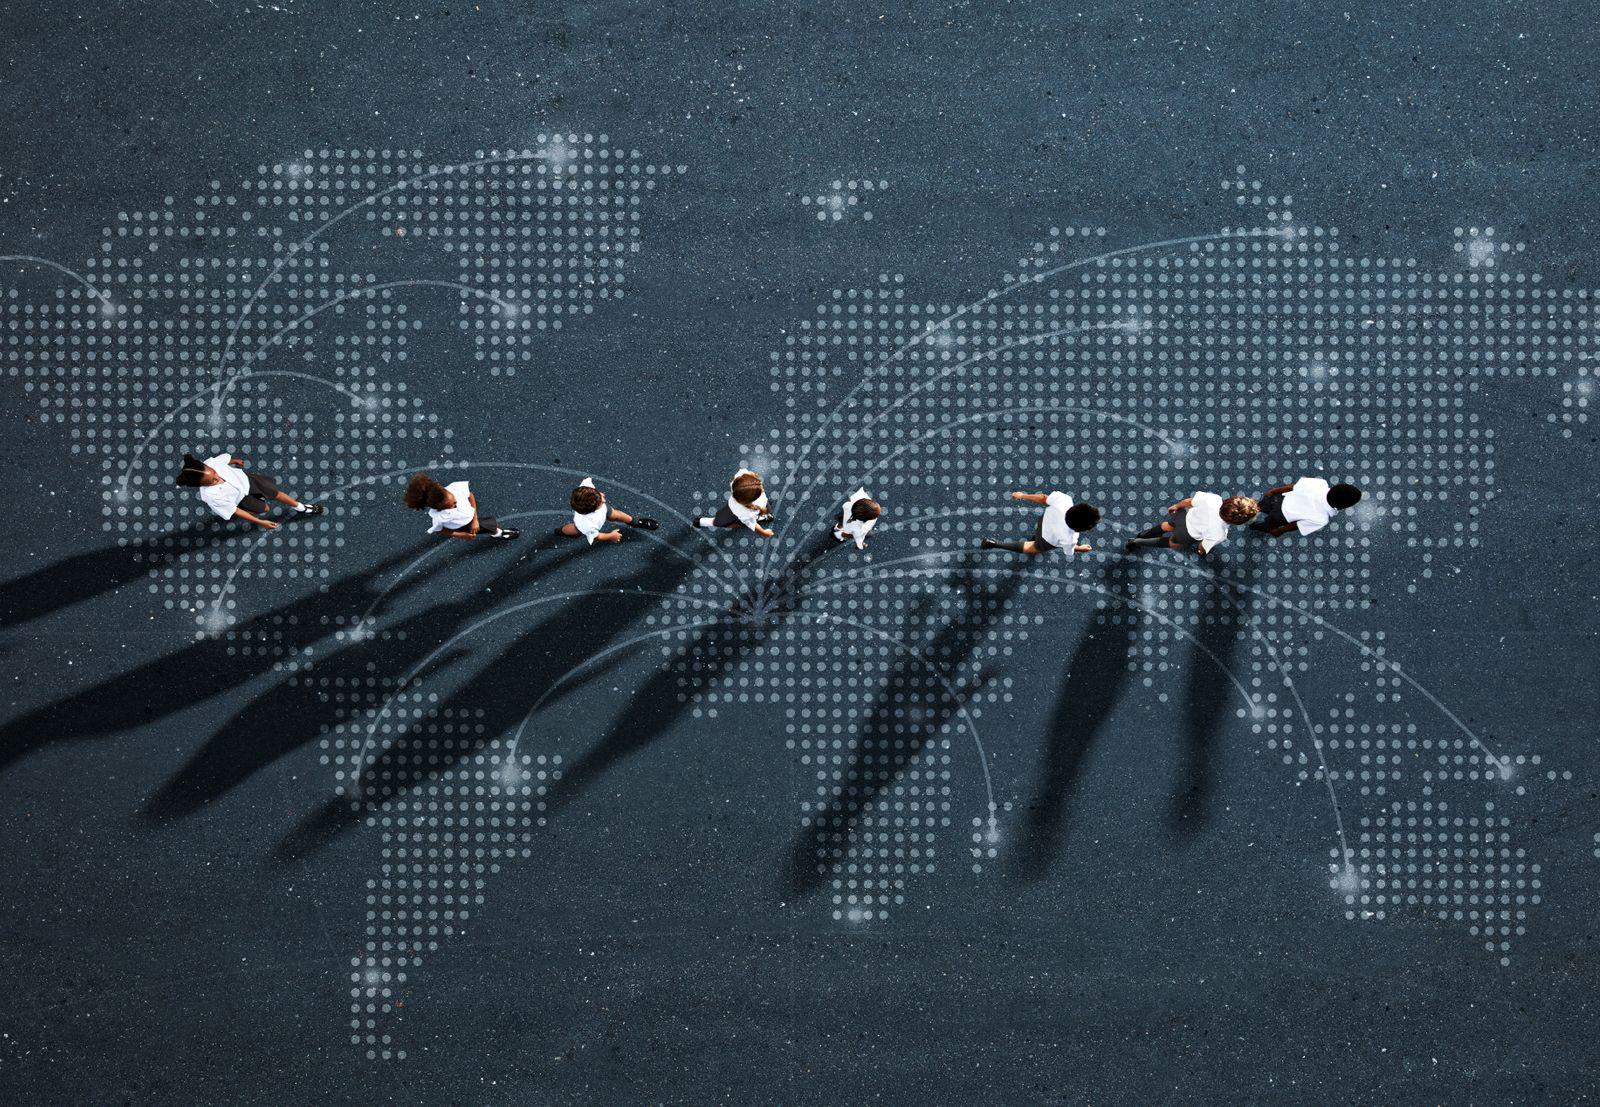 School children in uniforms walking in row across world map